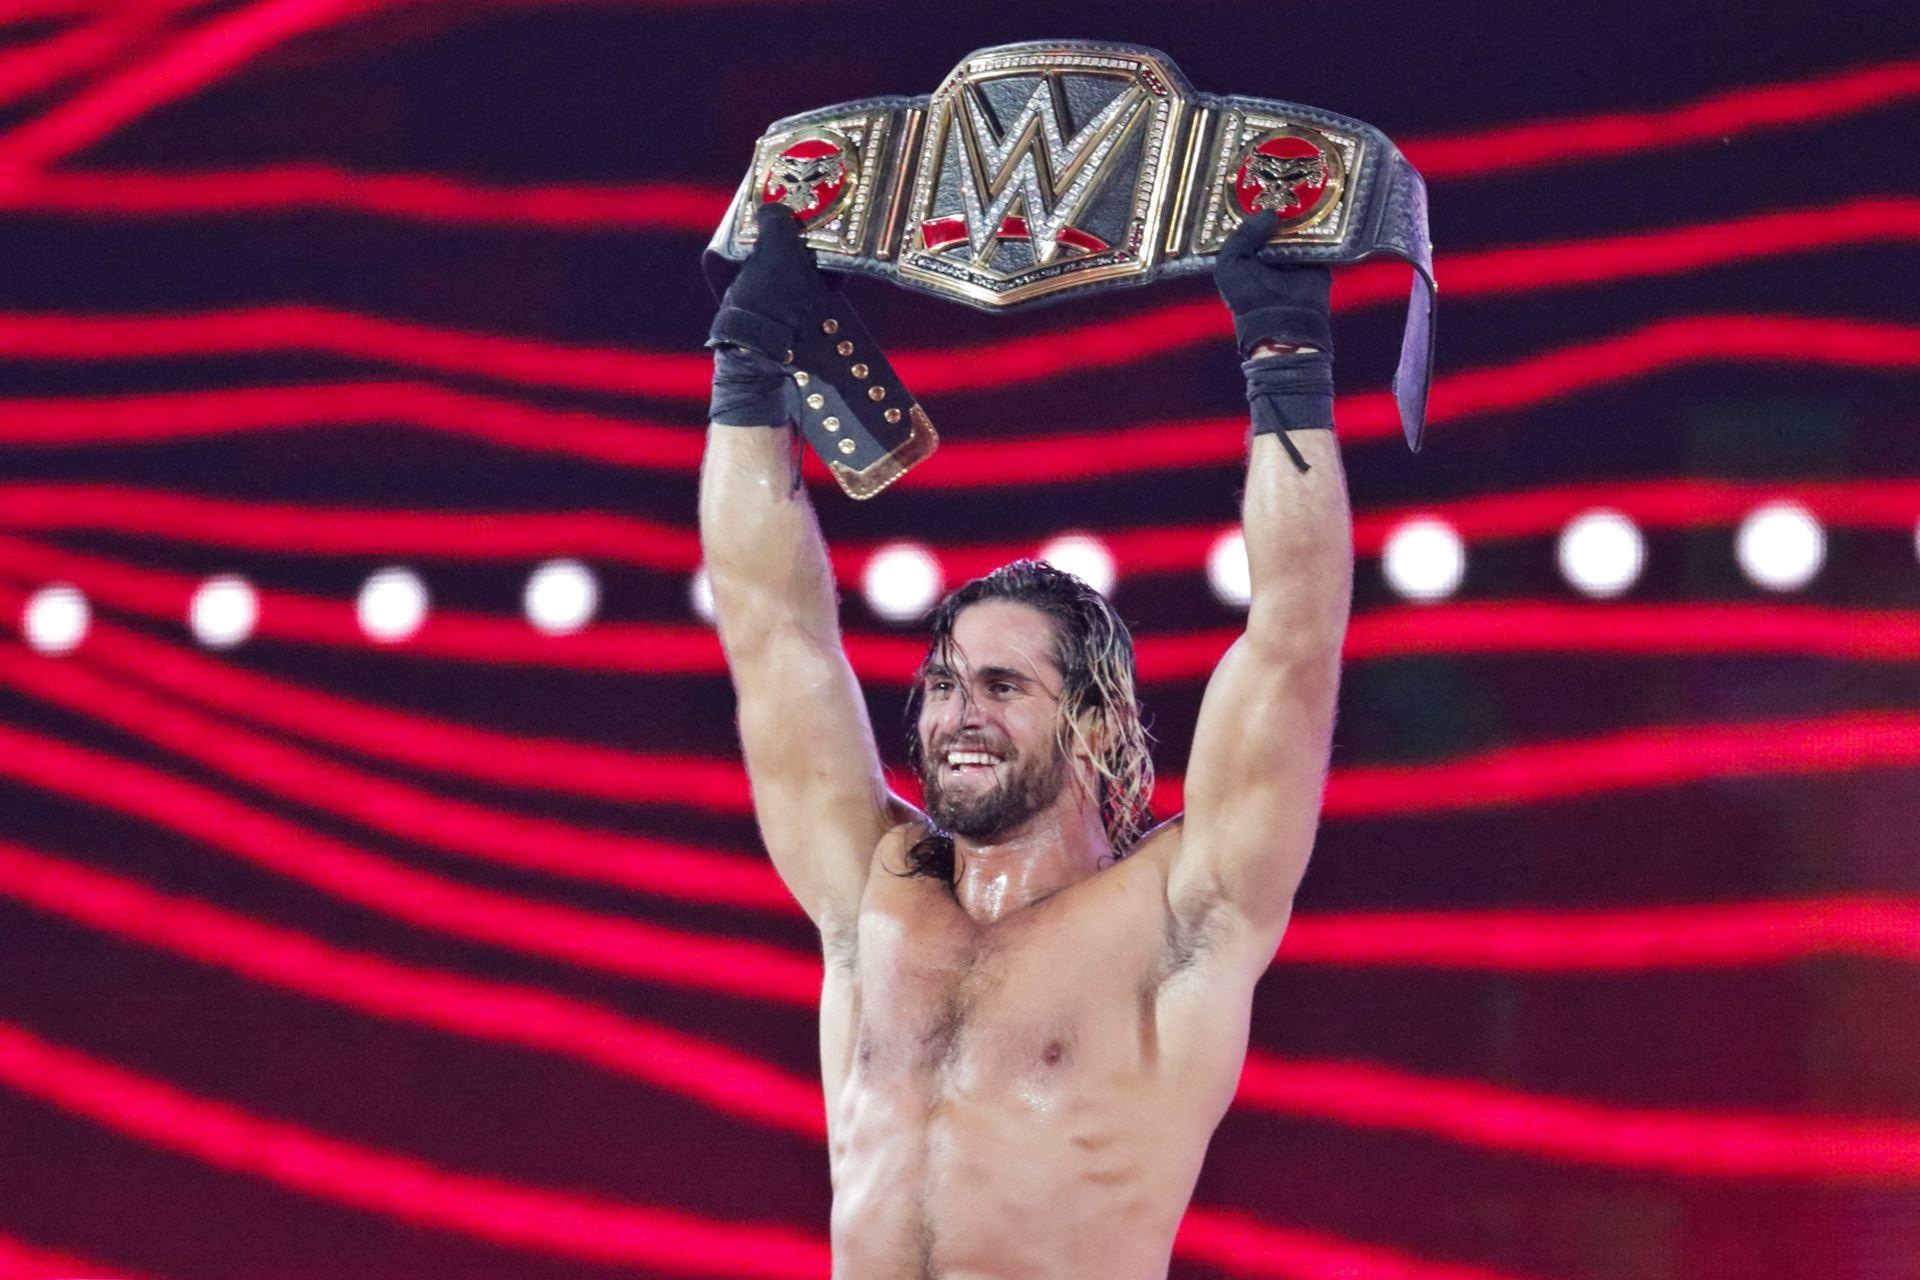 … Seth Rollins Winning A Belt HD Wallpaper #05968